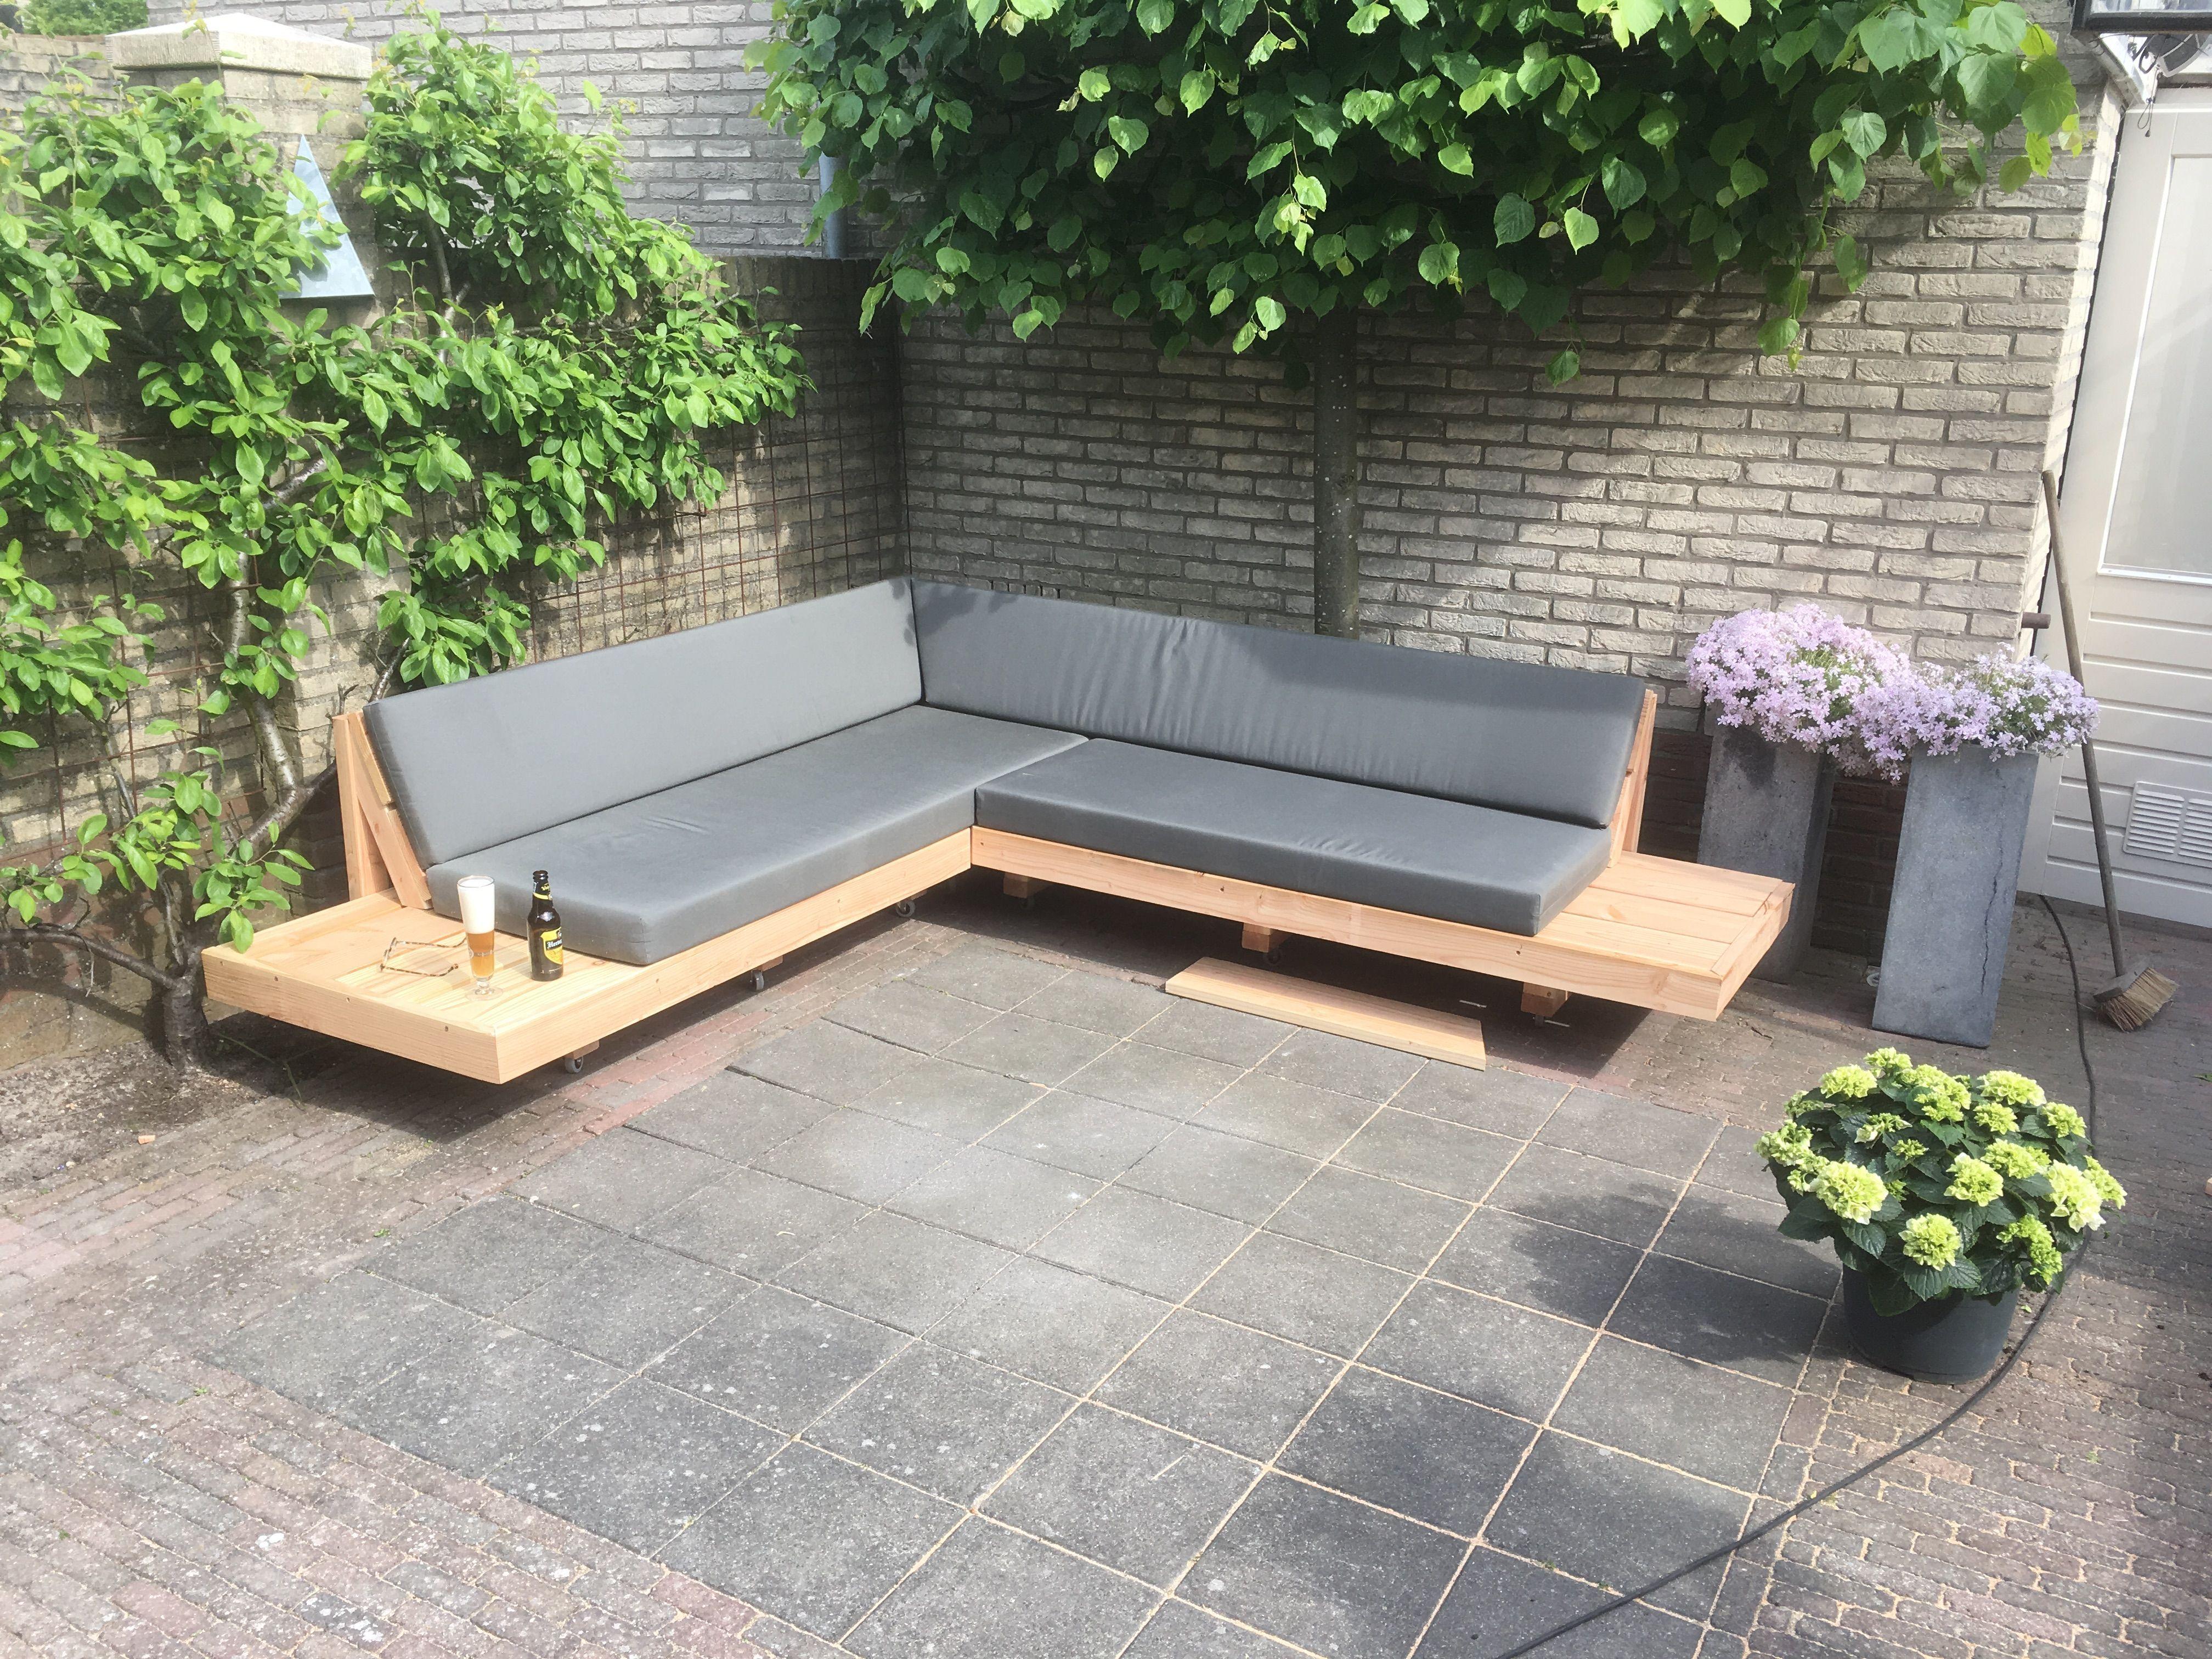 Pa Terassen Terassenuberdachung Pa Terassen Outdoor Sofa Diy